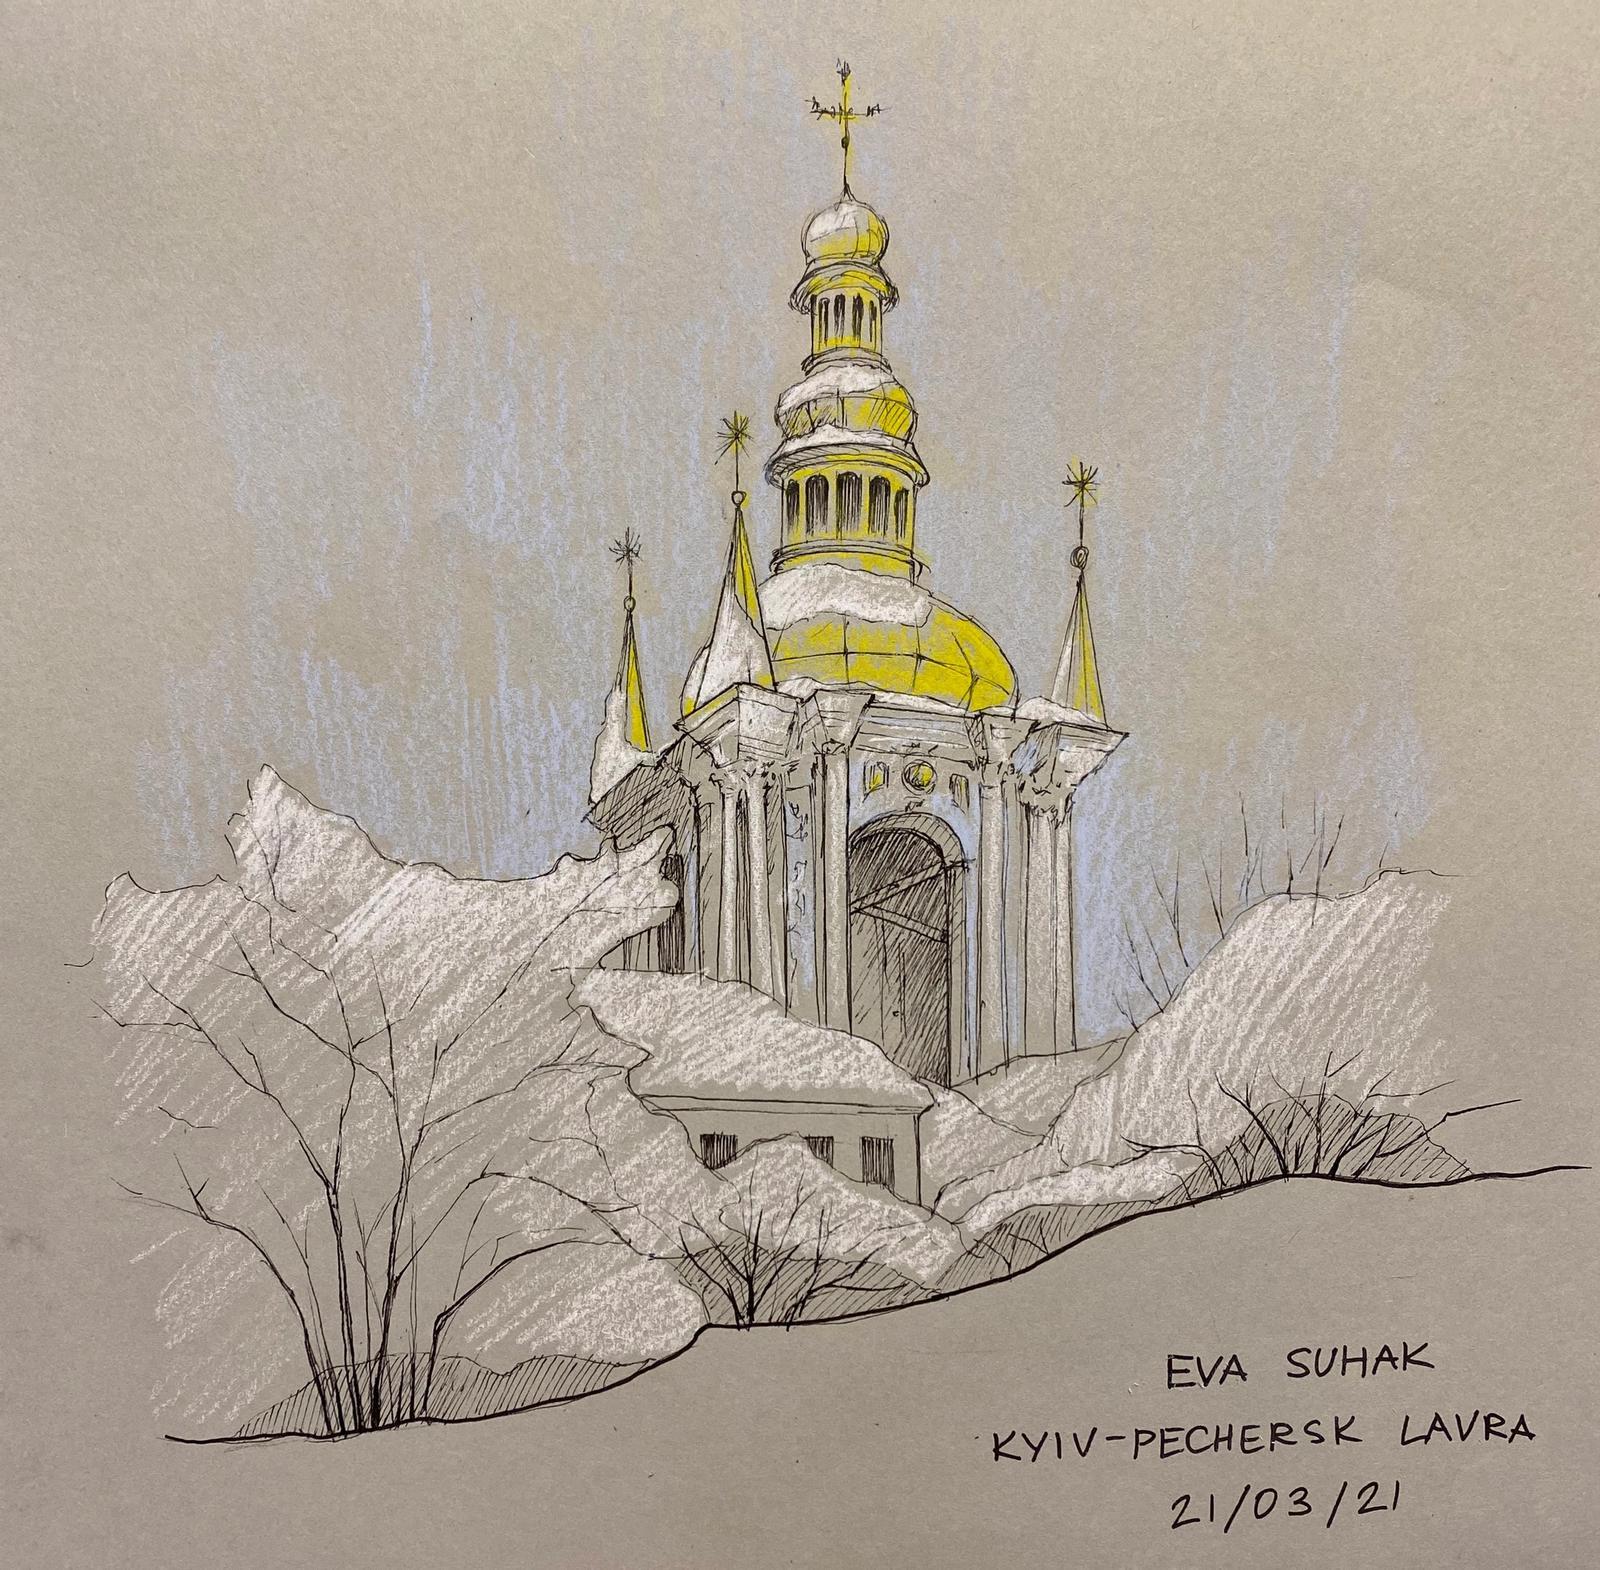 Kyiv-Pechersk Lavra - 4